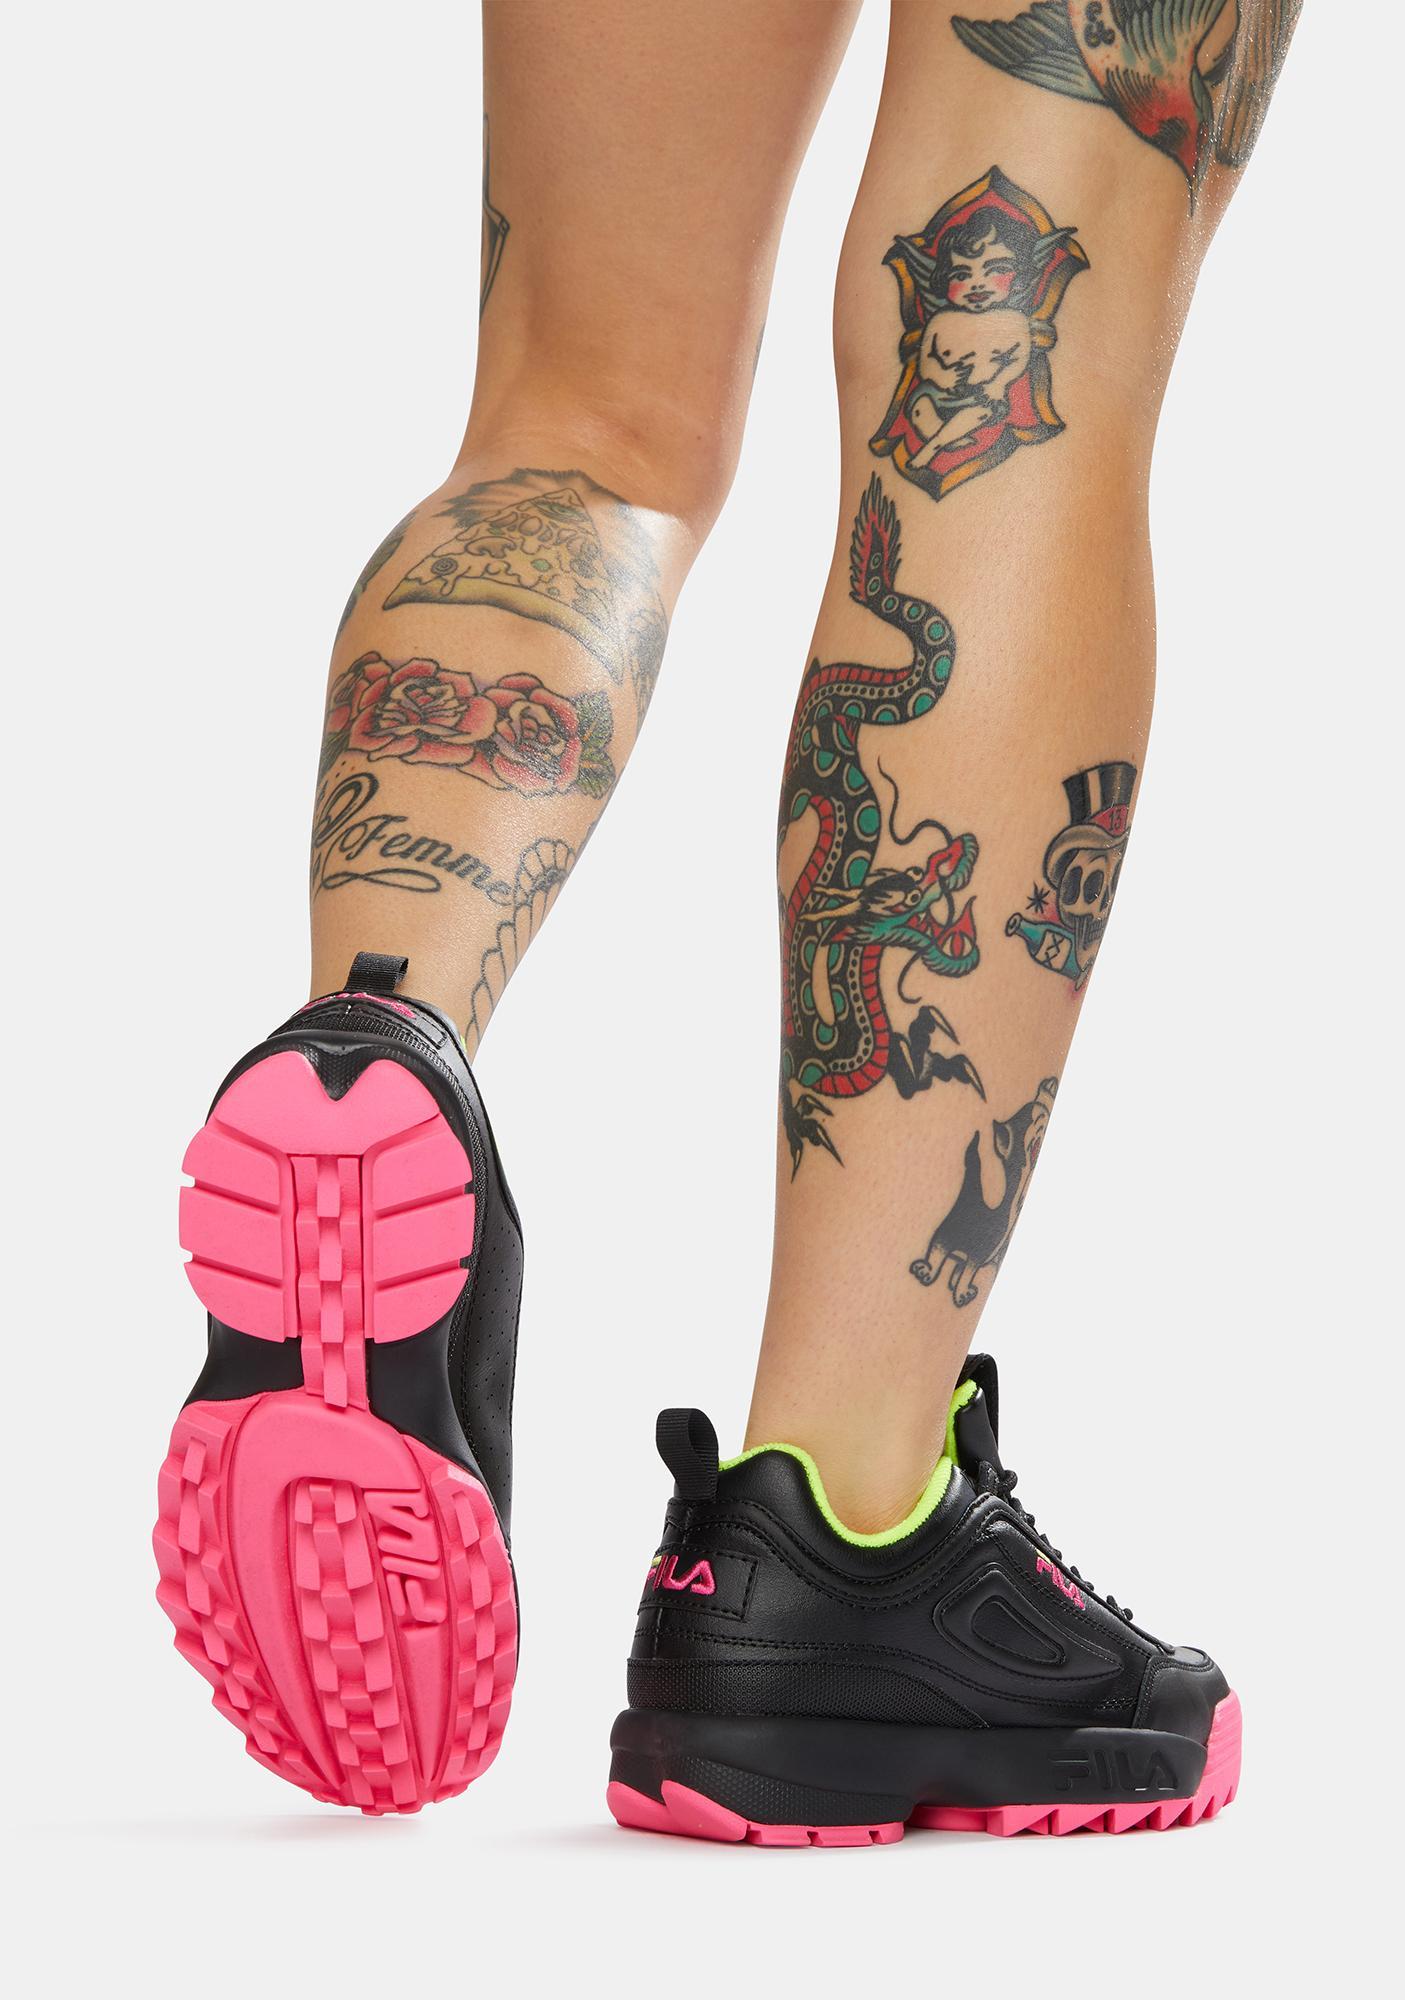 Fila Volt Disruptor II Premium Sneakers